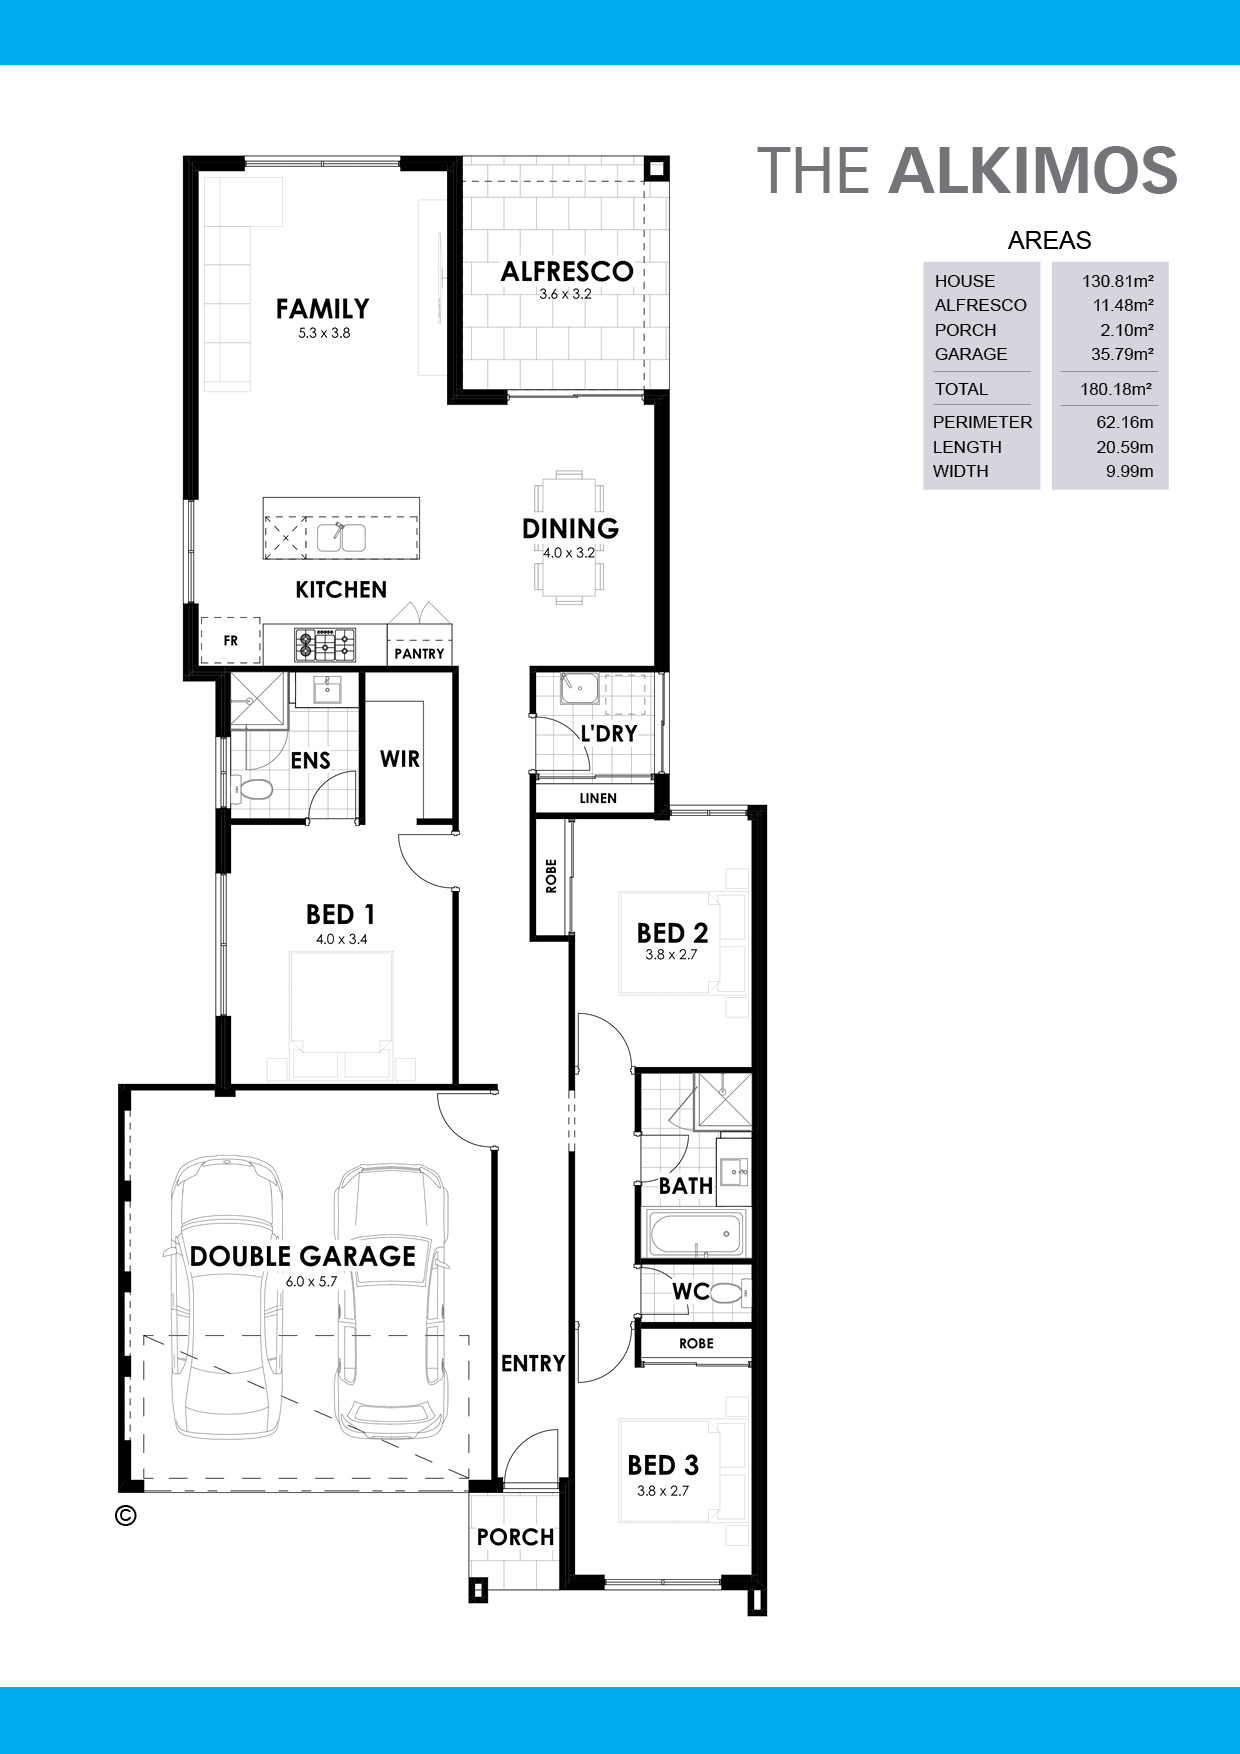 The Alkimos Floorplan